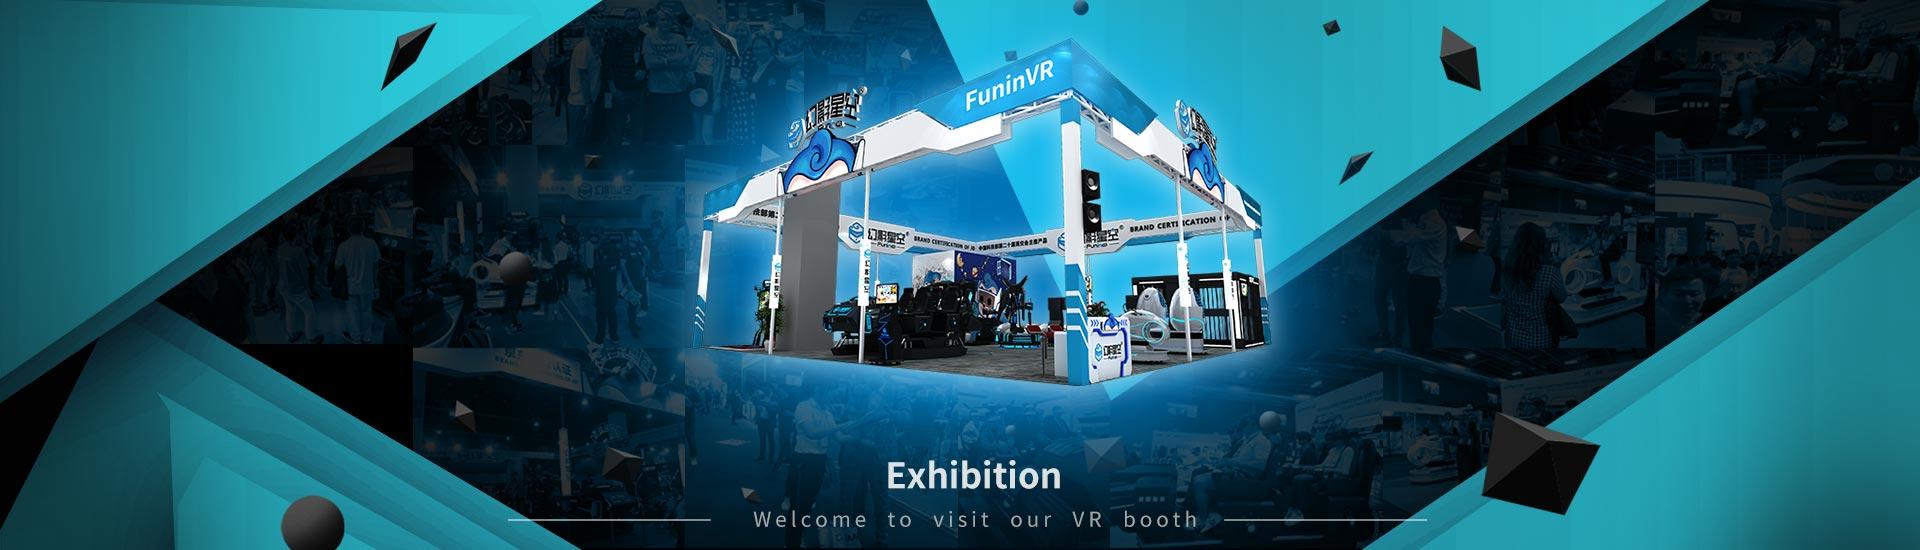 Guangzhou Zhuoyuan 9dVR Simulator manufacturer Build Successfully In Canton Fair